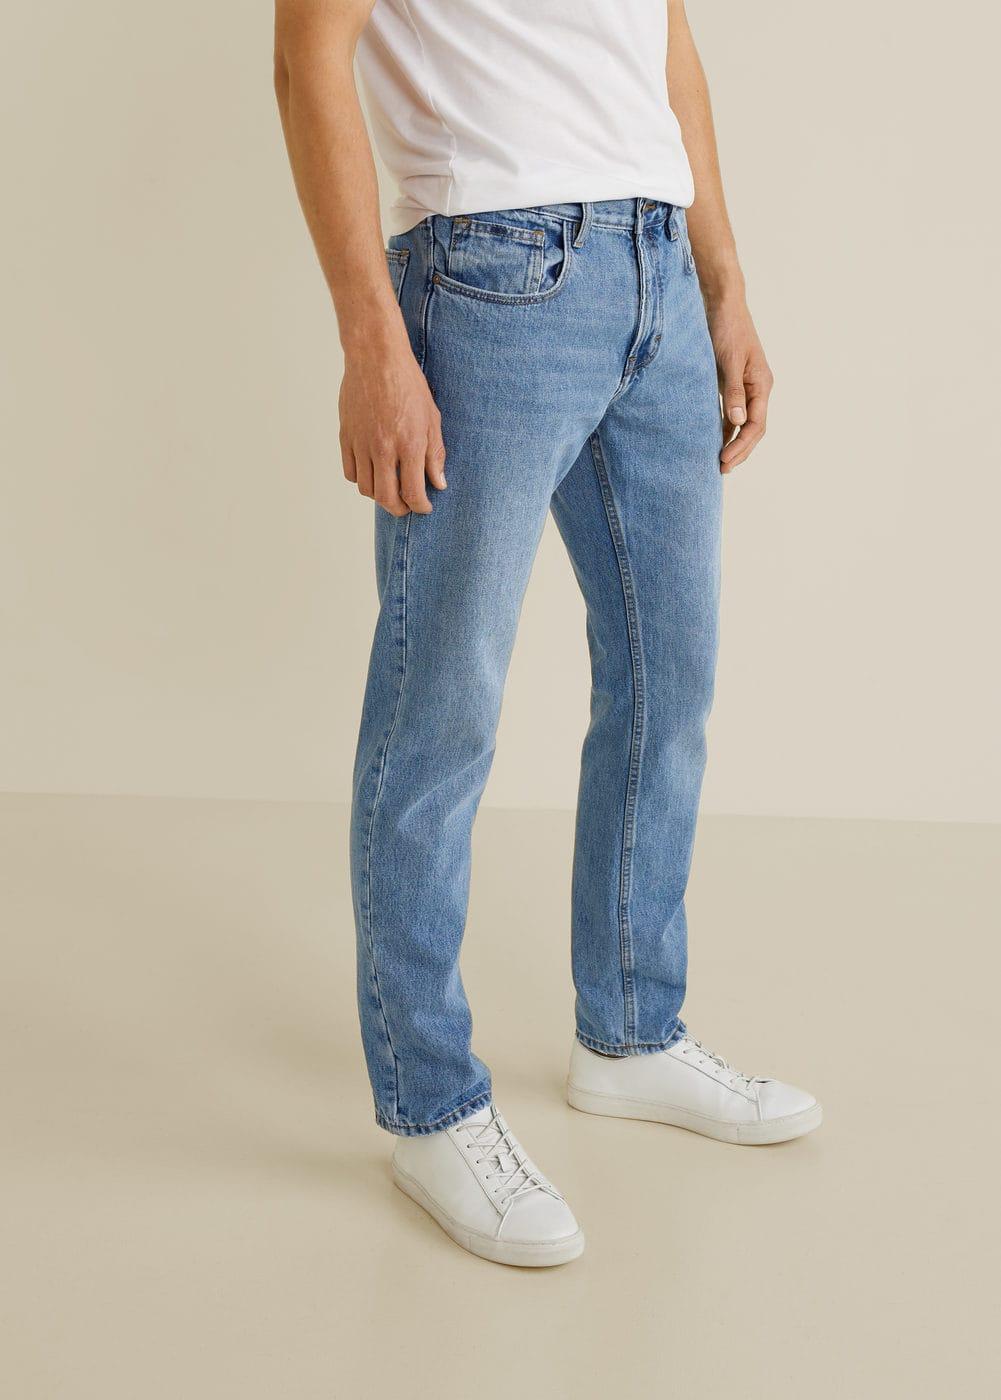 h-bob5:jeans bob regular fit lavado claro